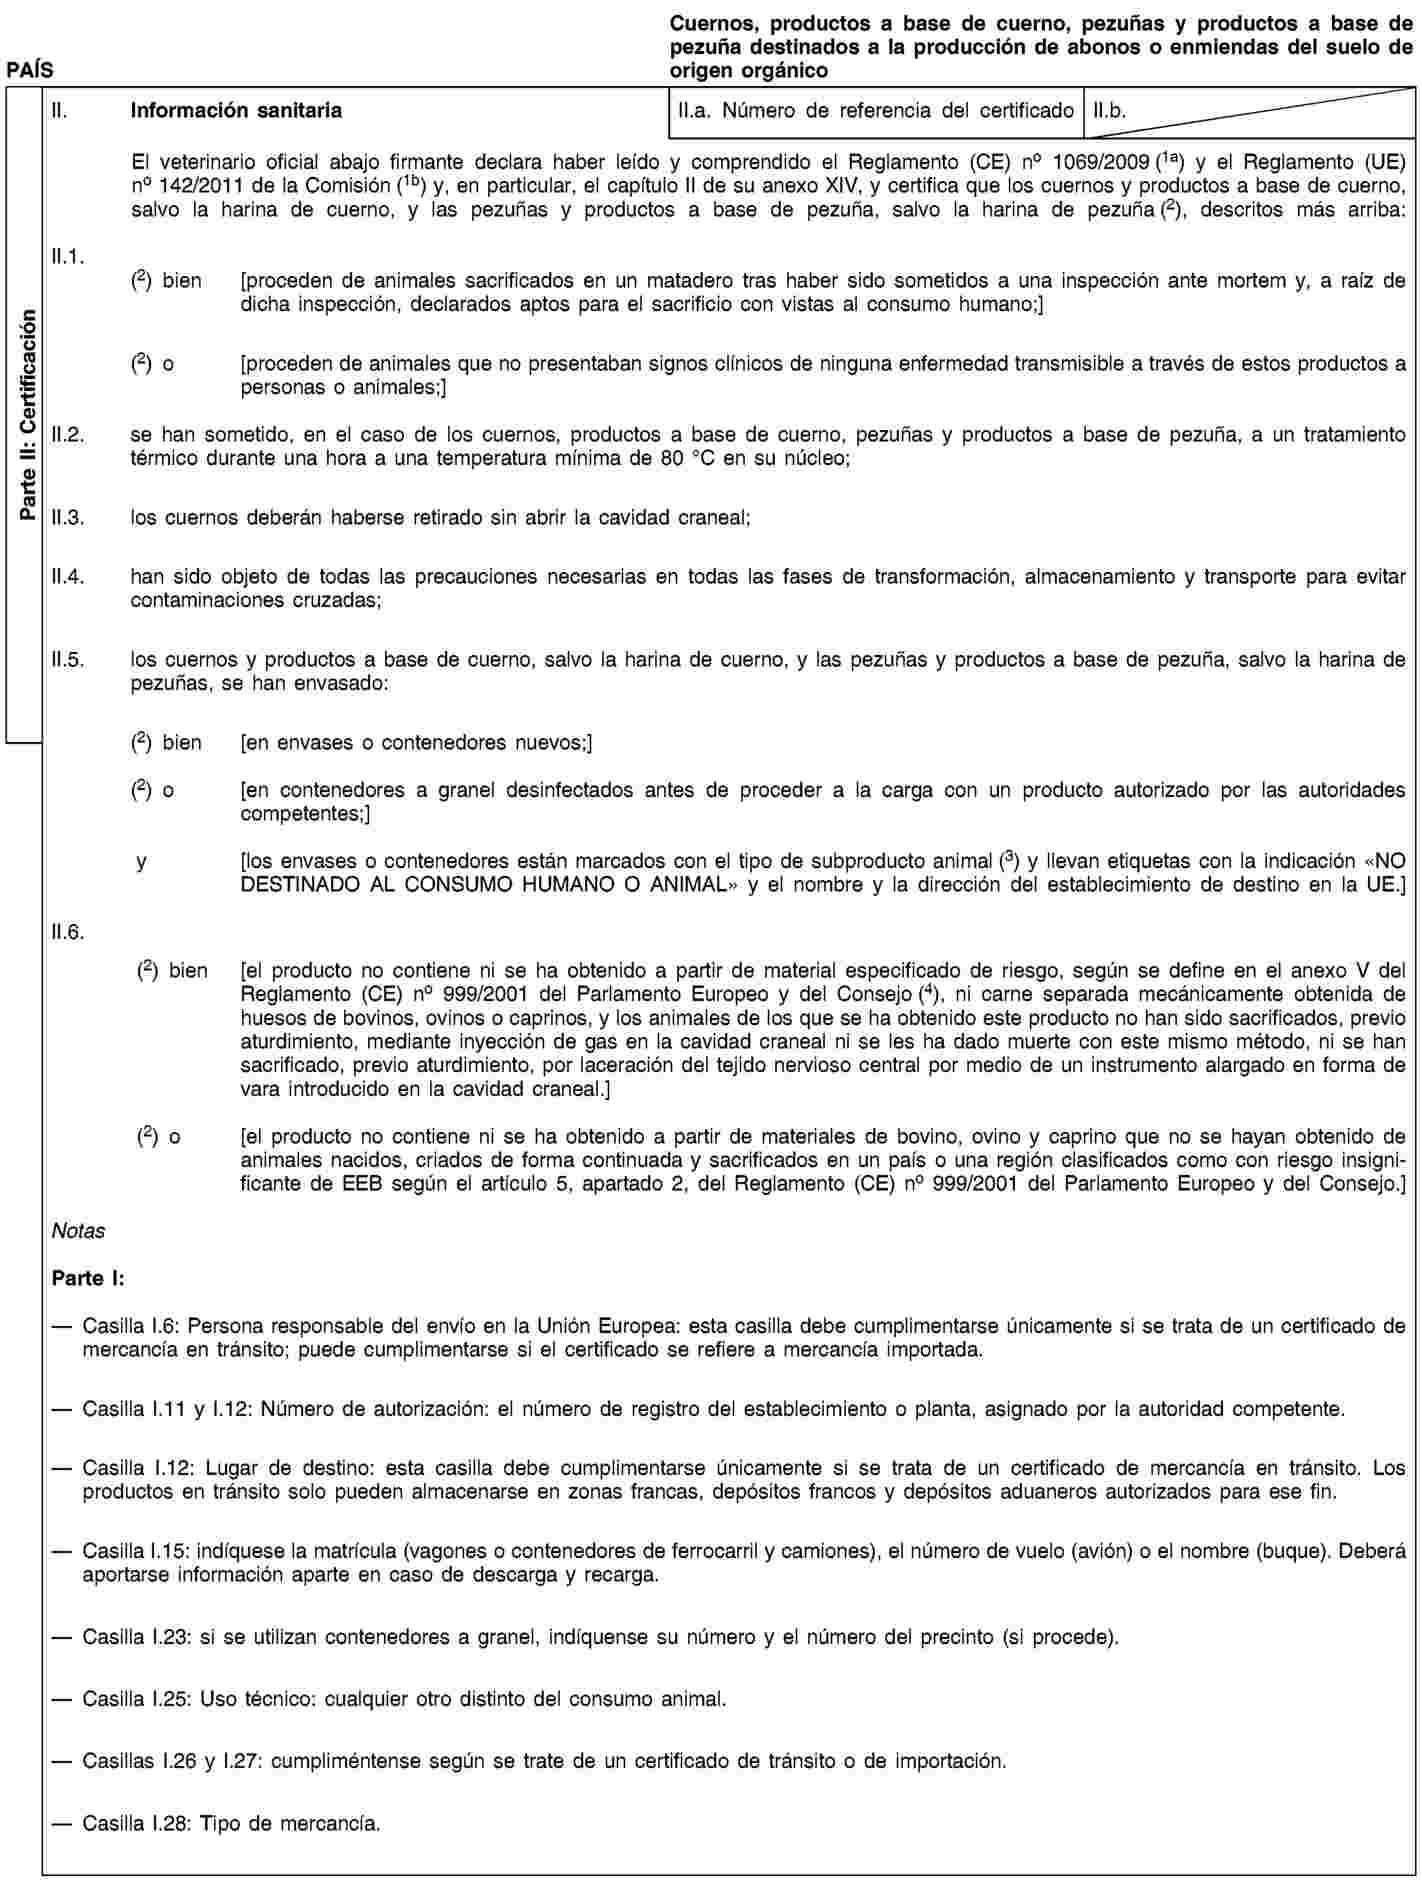 Imagen: https://eur-lex.europa.eu/resource.html?uri=uriserv:OJ.L_.2011.054.01.0001.01.SPA.xhtml.L_2011054ES.01024001.tif.jpg